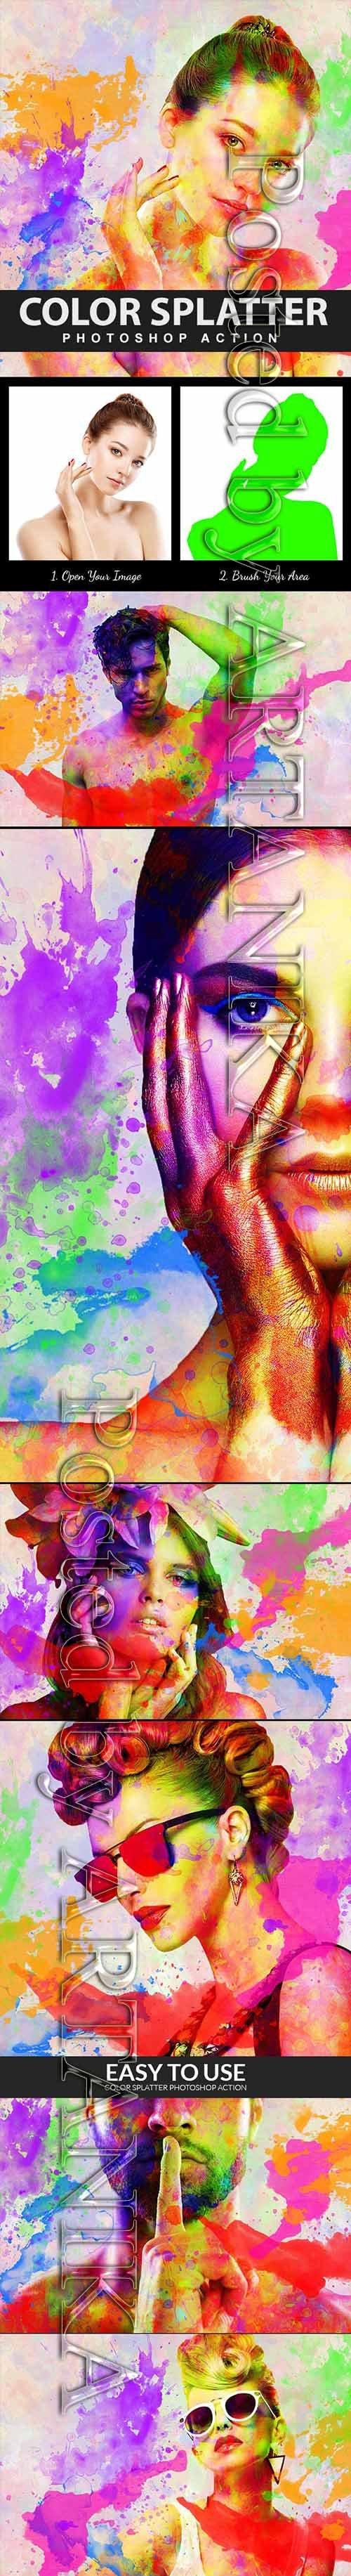 Graphicriver - Color Splatter Photoshop Action 21285947